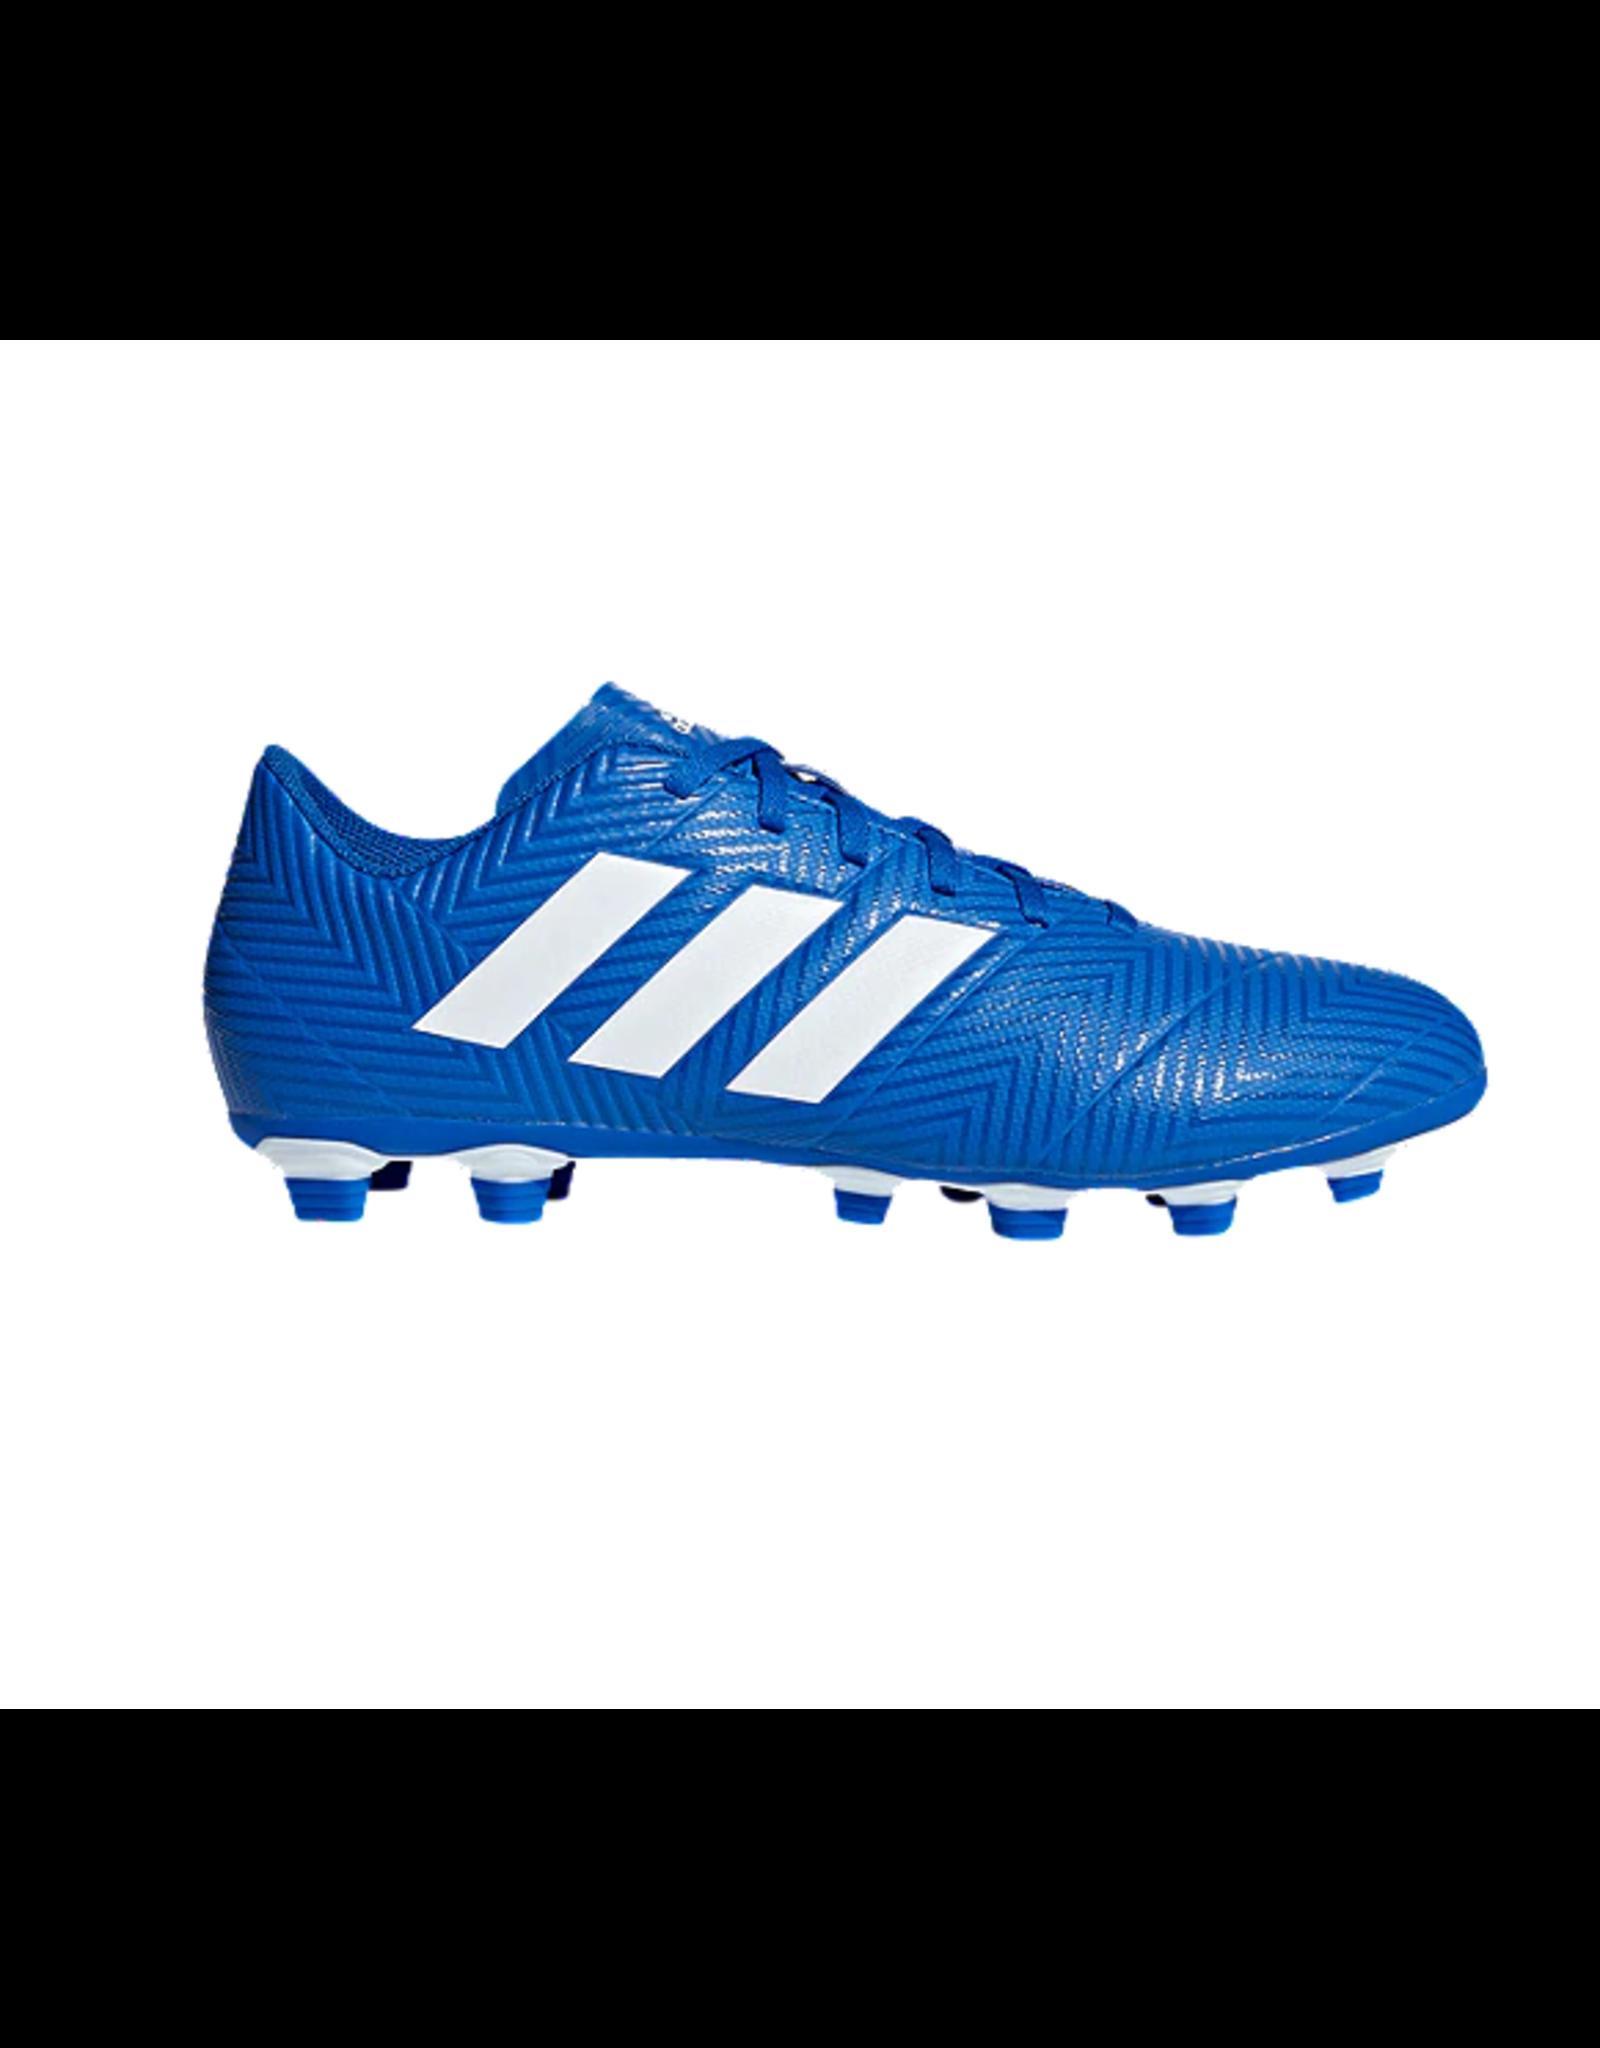 Adidas Adidas NEMEZIZ 18.4 FxG Cleats (Football Blue/Cloud White/Football Blue)